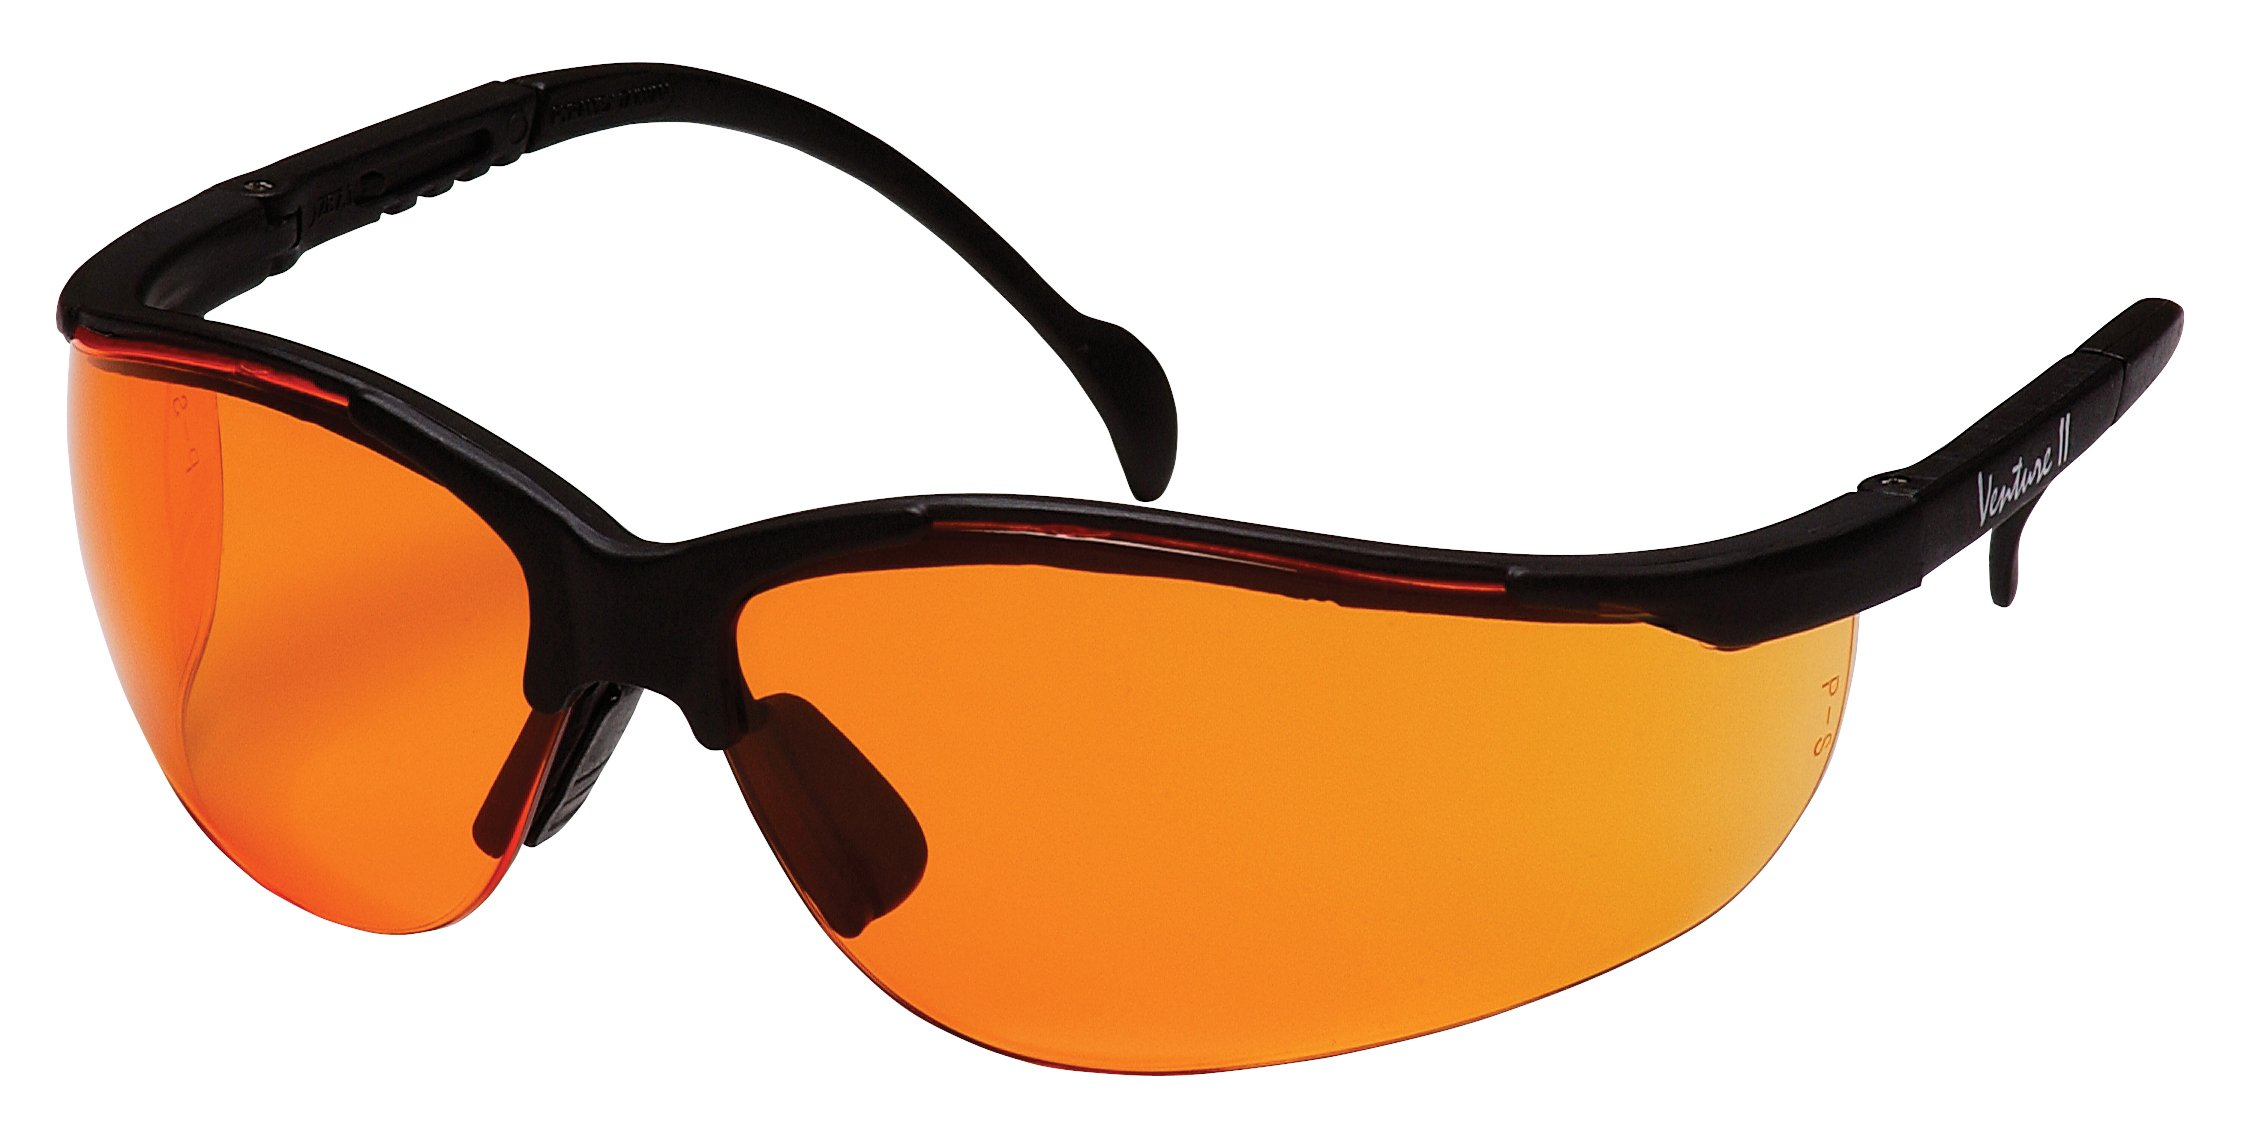 Pyramex Venture Ii Safety Eyewear, Orange Lens With Black Frame by Pyramex Safety